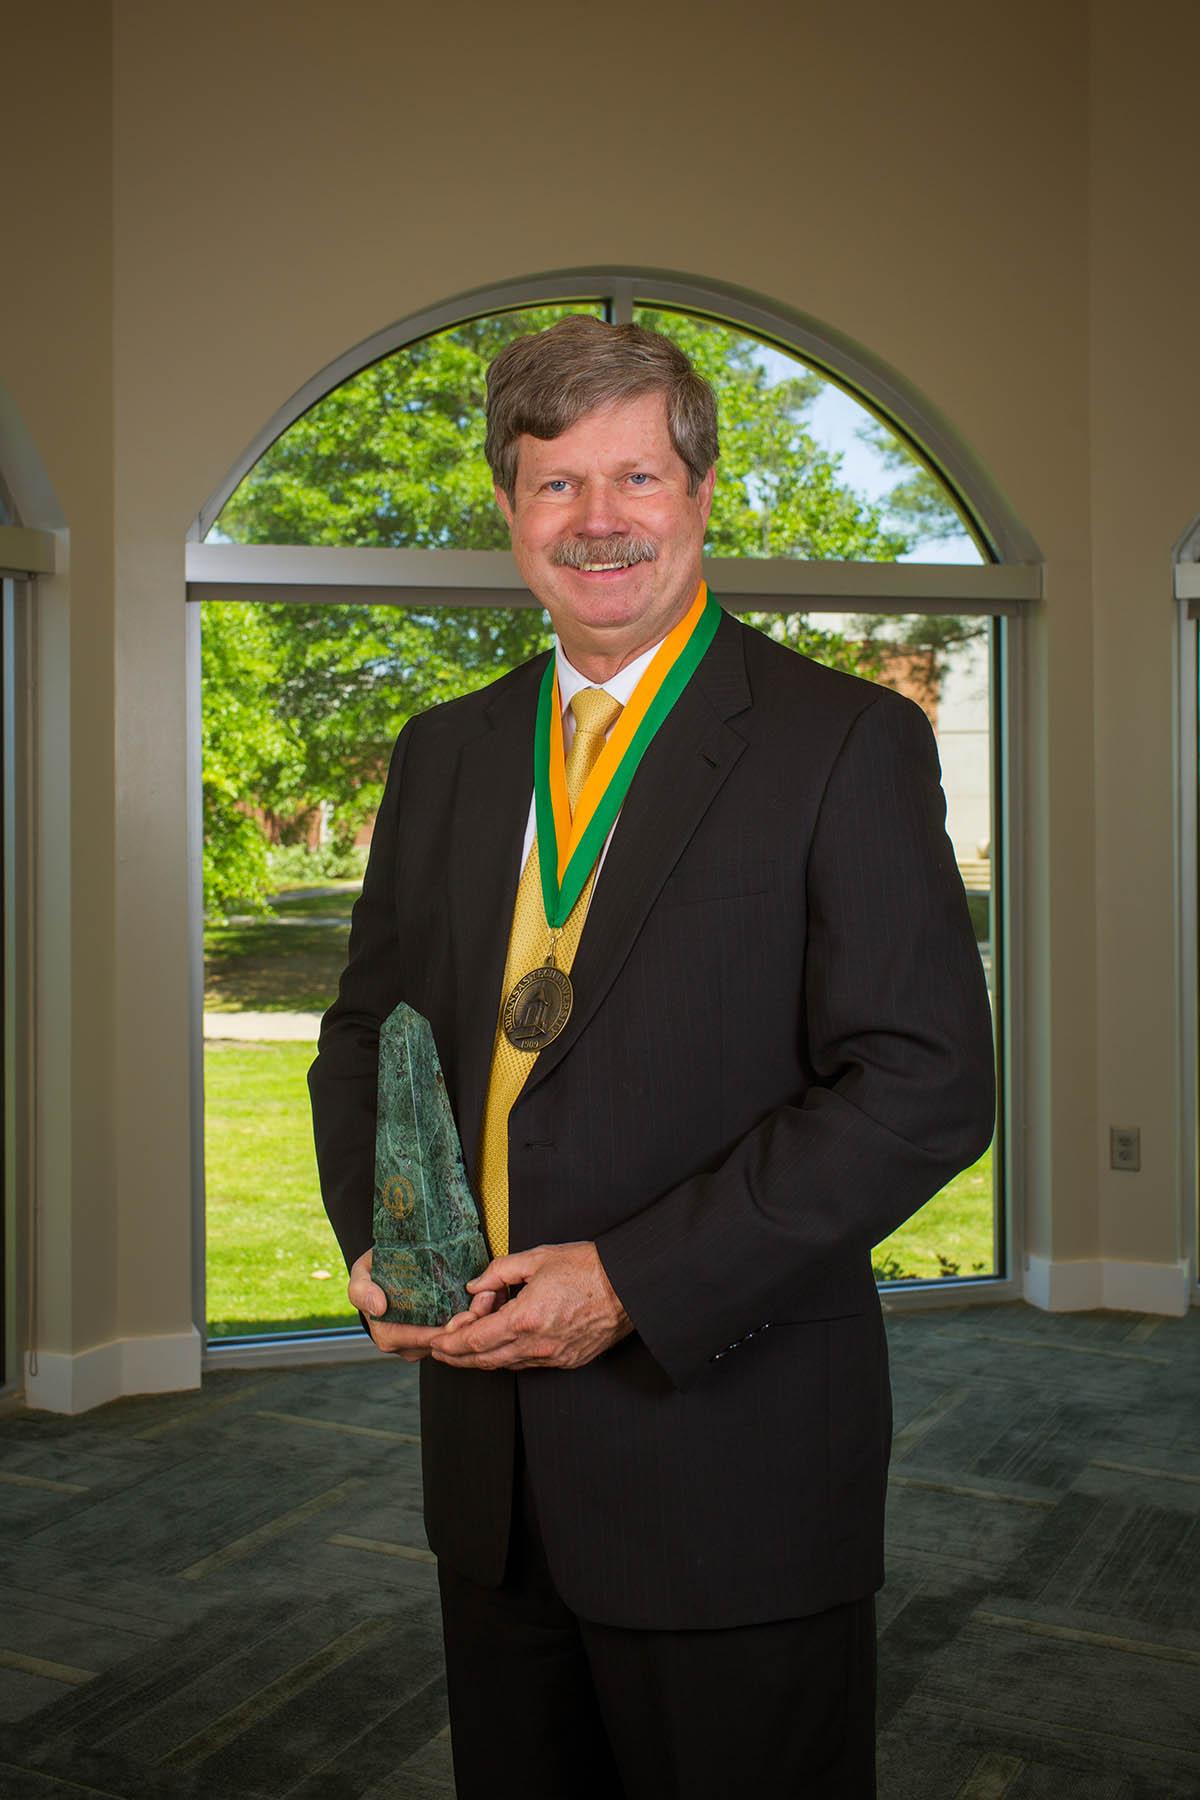 Arkansas Tech University - Distinguished Alumnus or Alumna